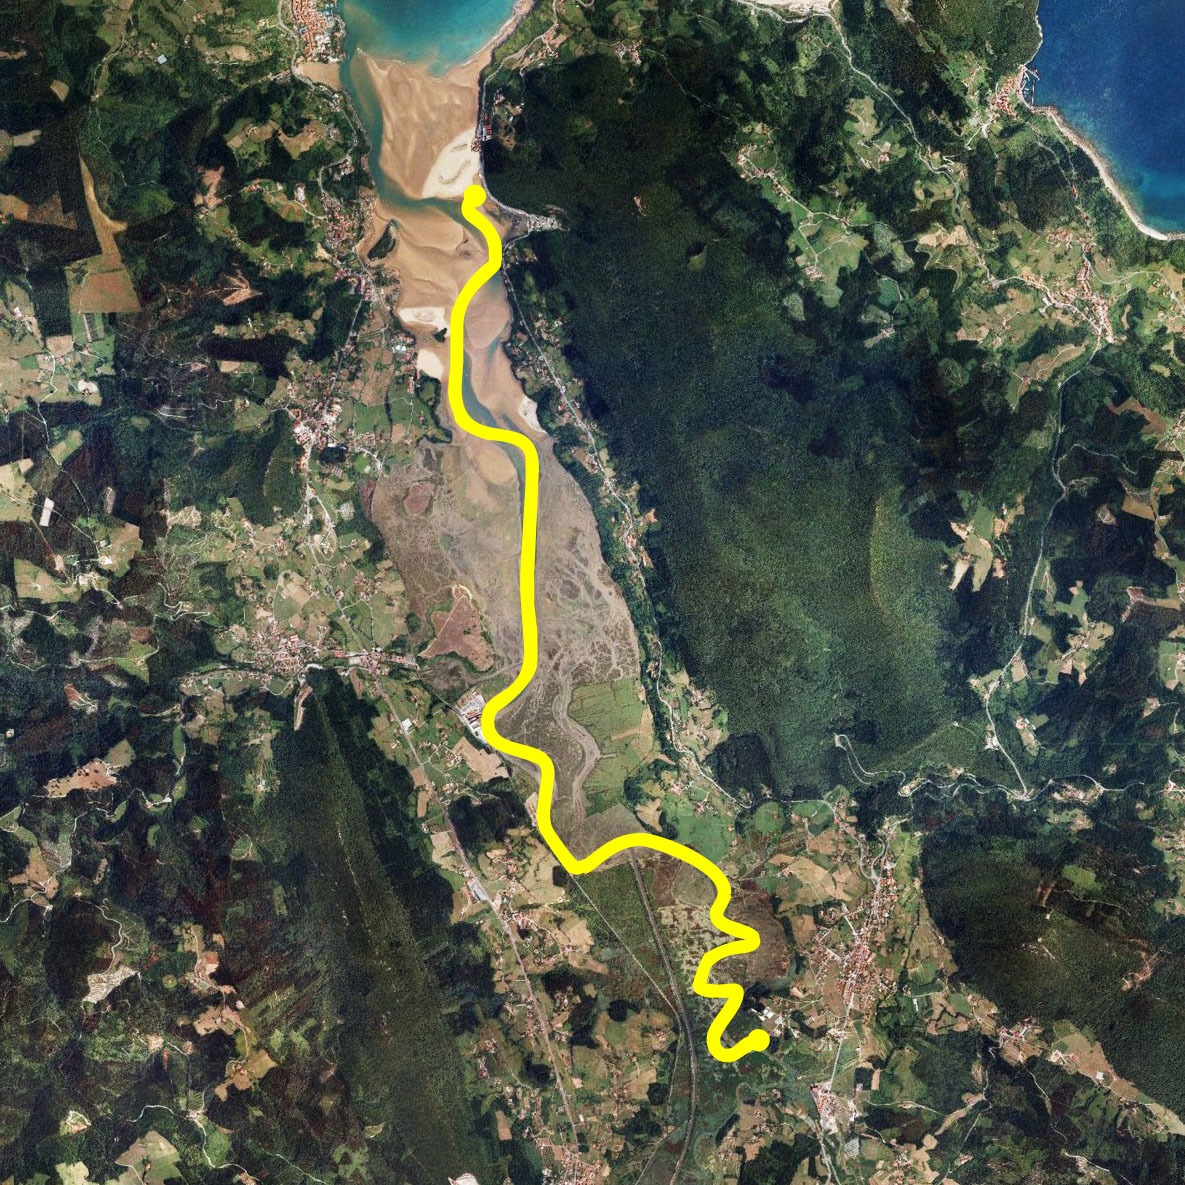 Laida Kanoak - Descensos en canoa, kayak y stand up pddle, mapa Urdaibai